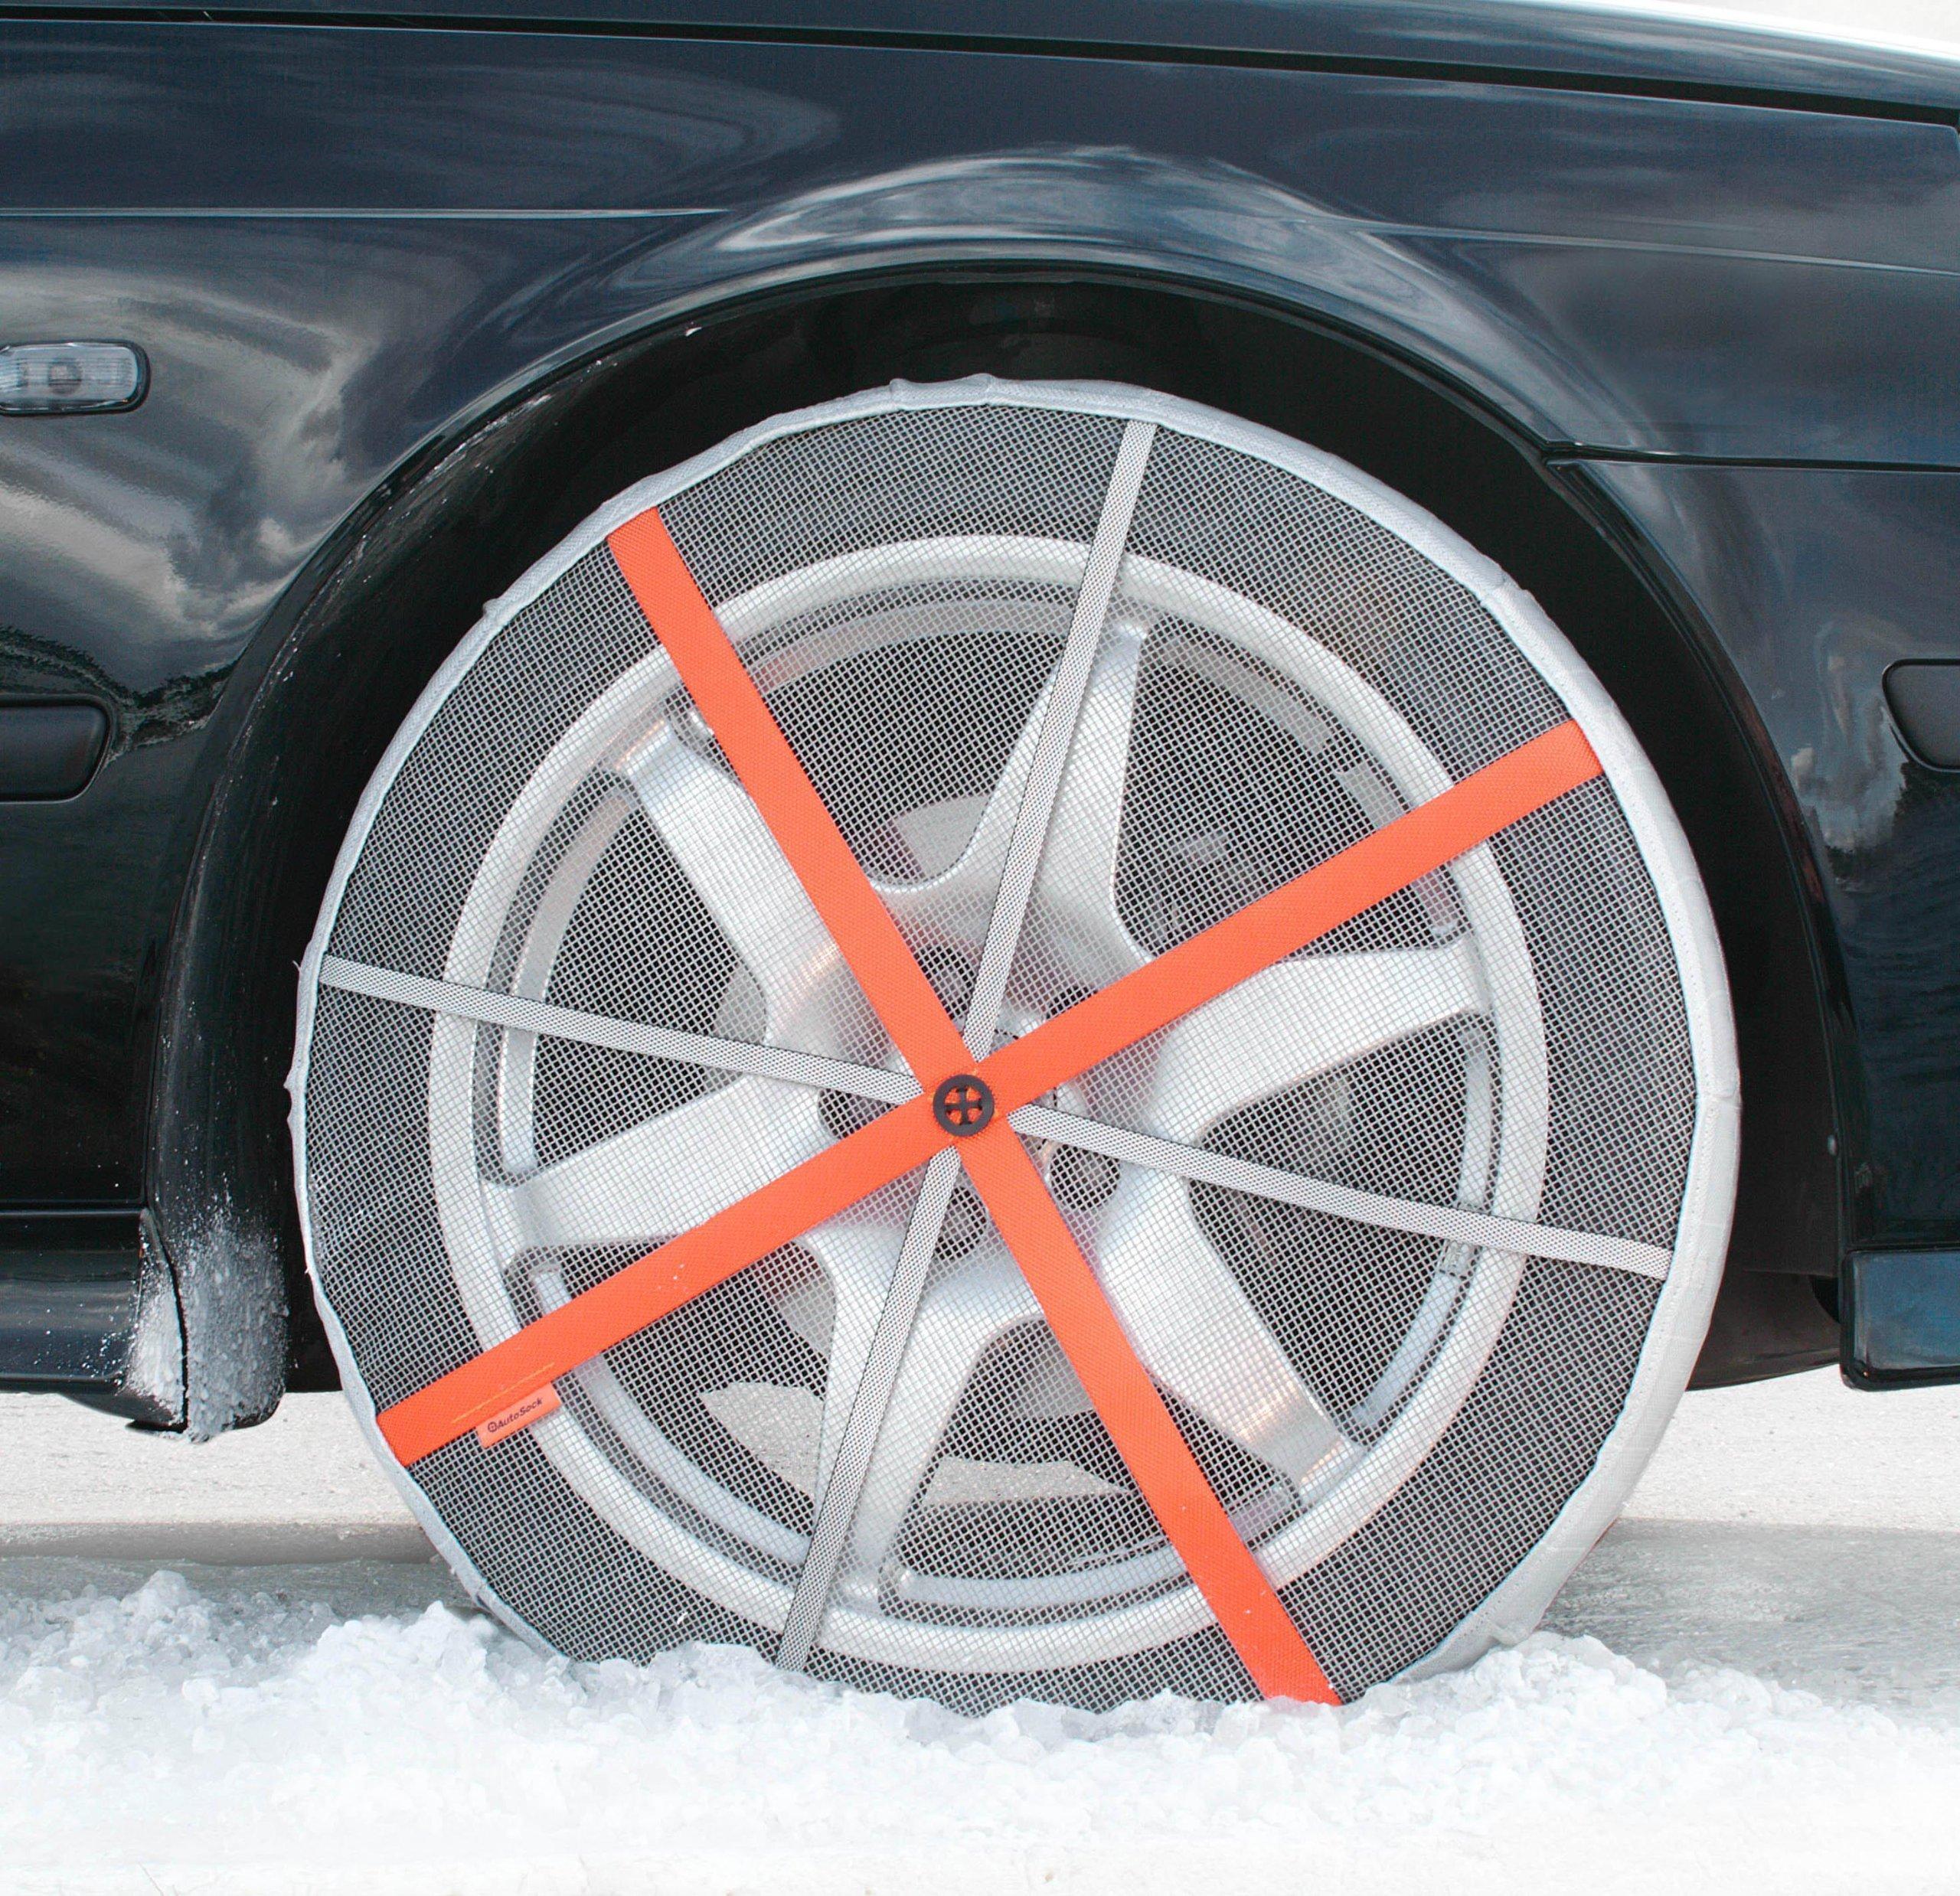 AutoSock 685 Size-685 Tire Chain Alternative by AutoSock (Image #2)